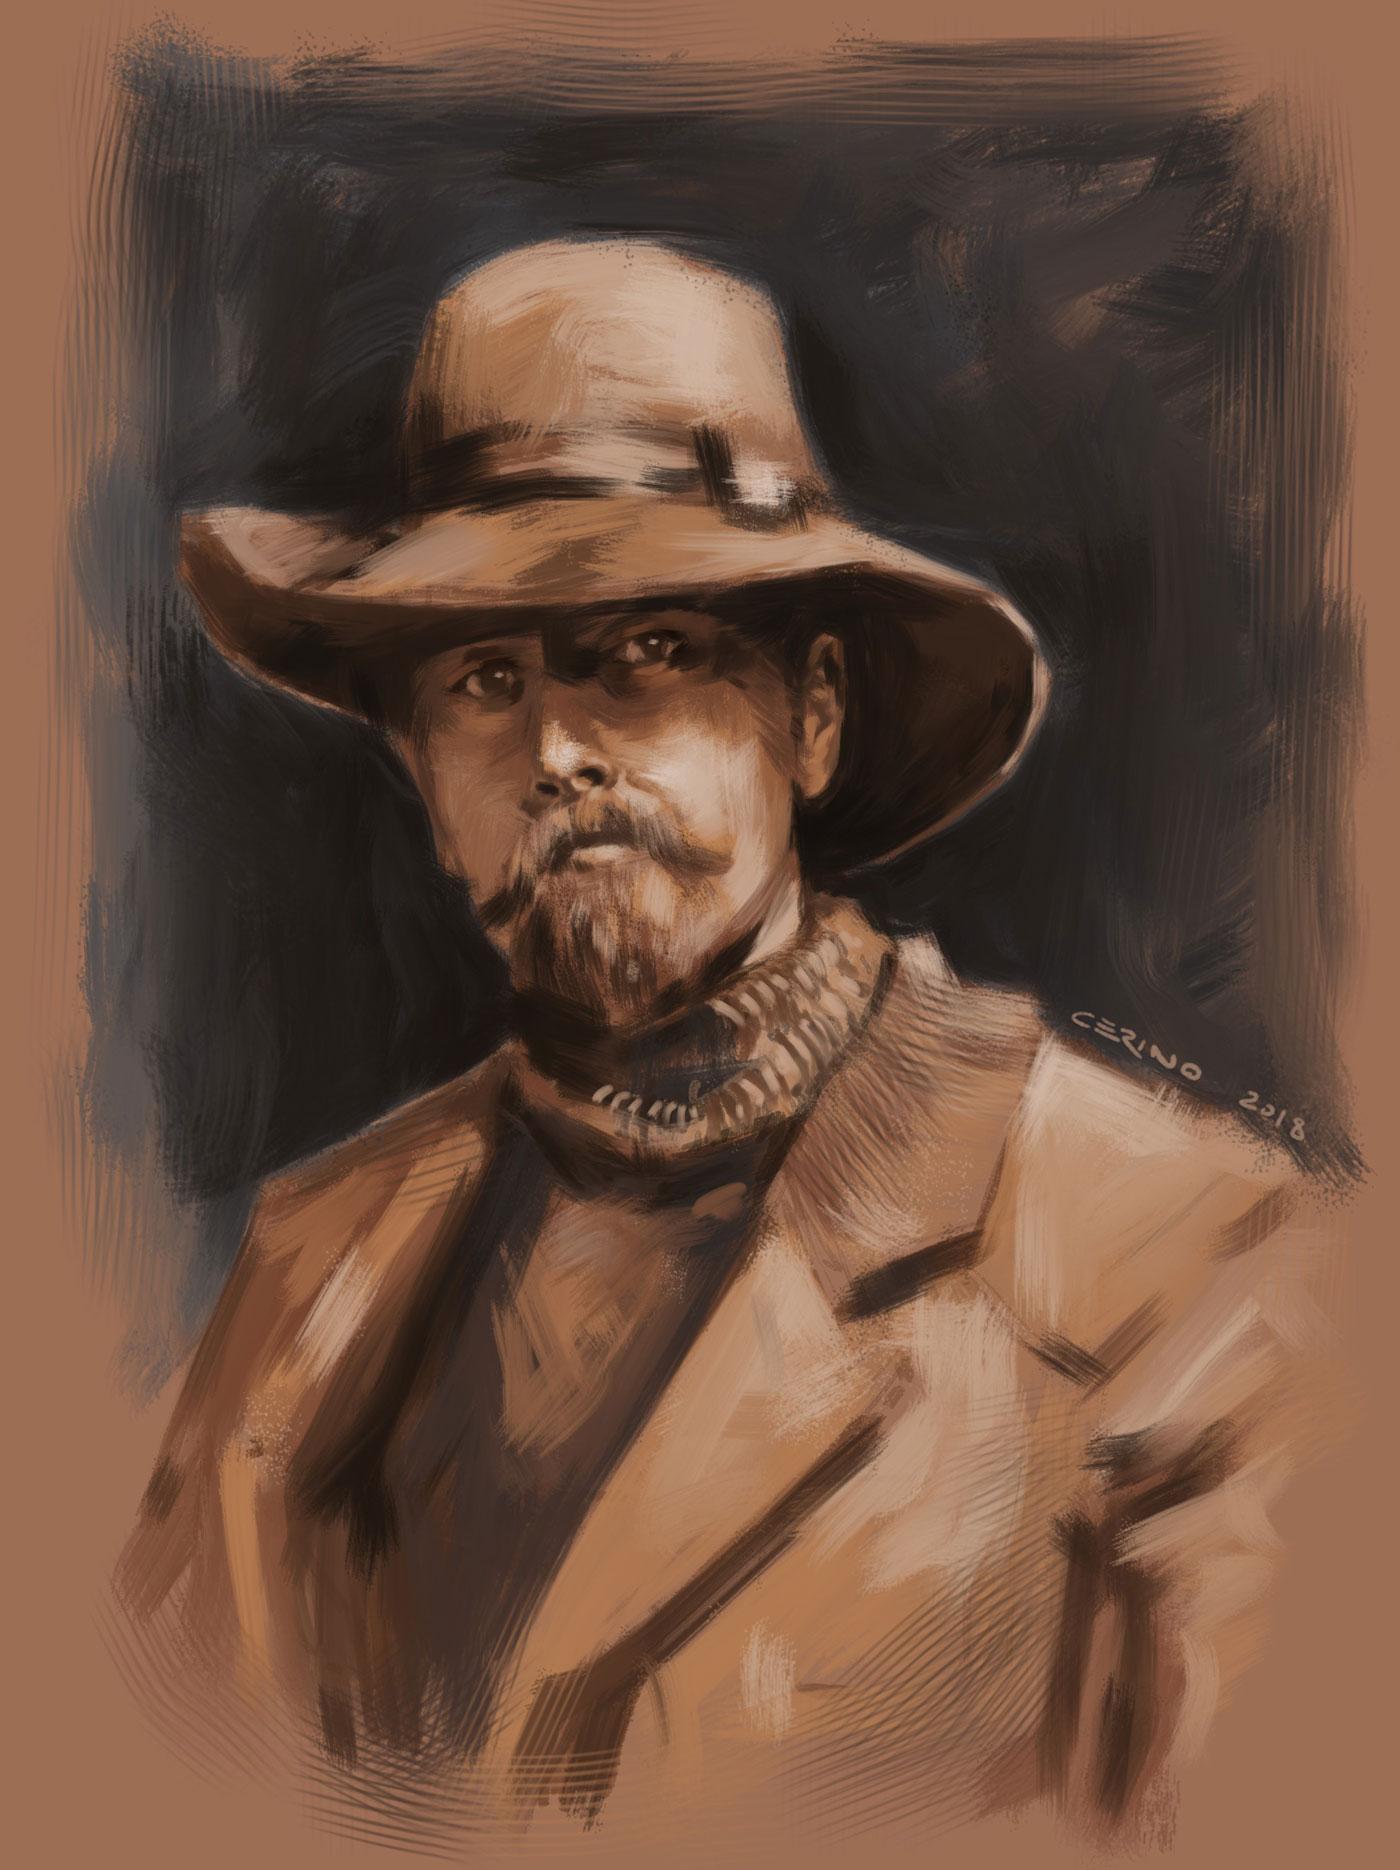 Random portrait by Cerino